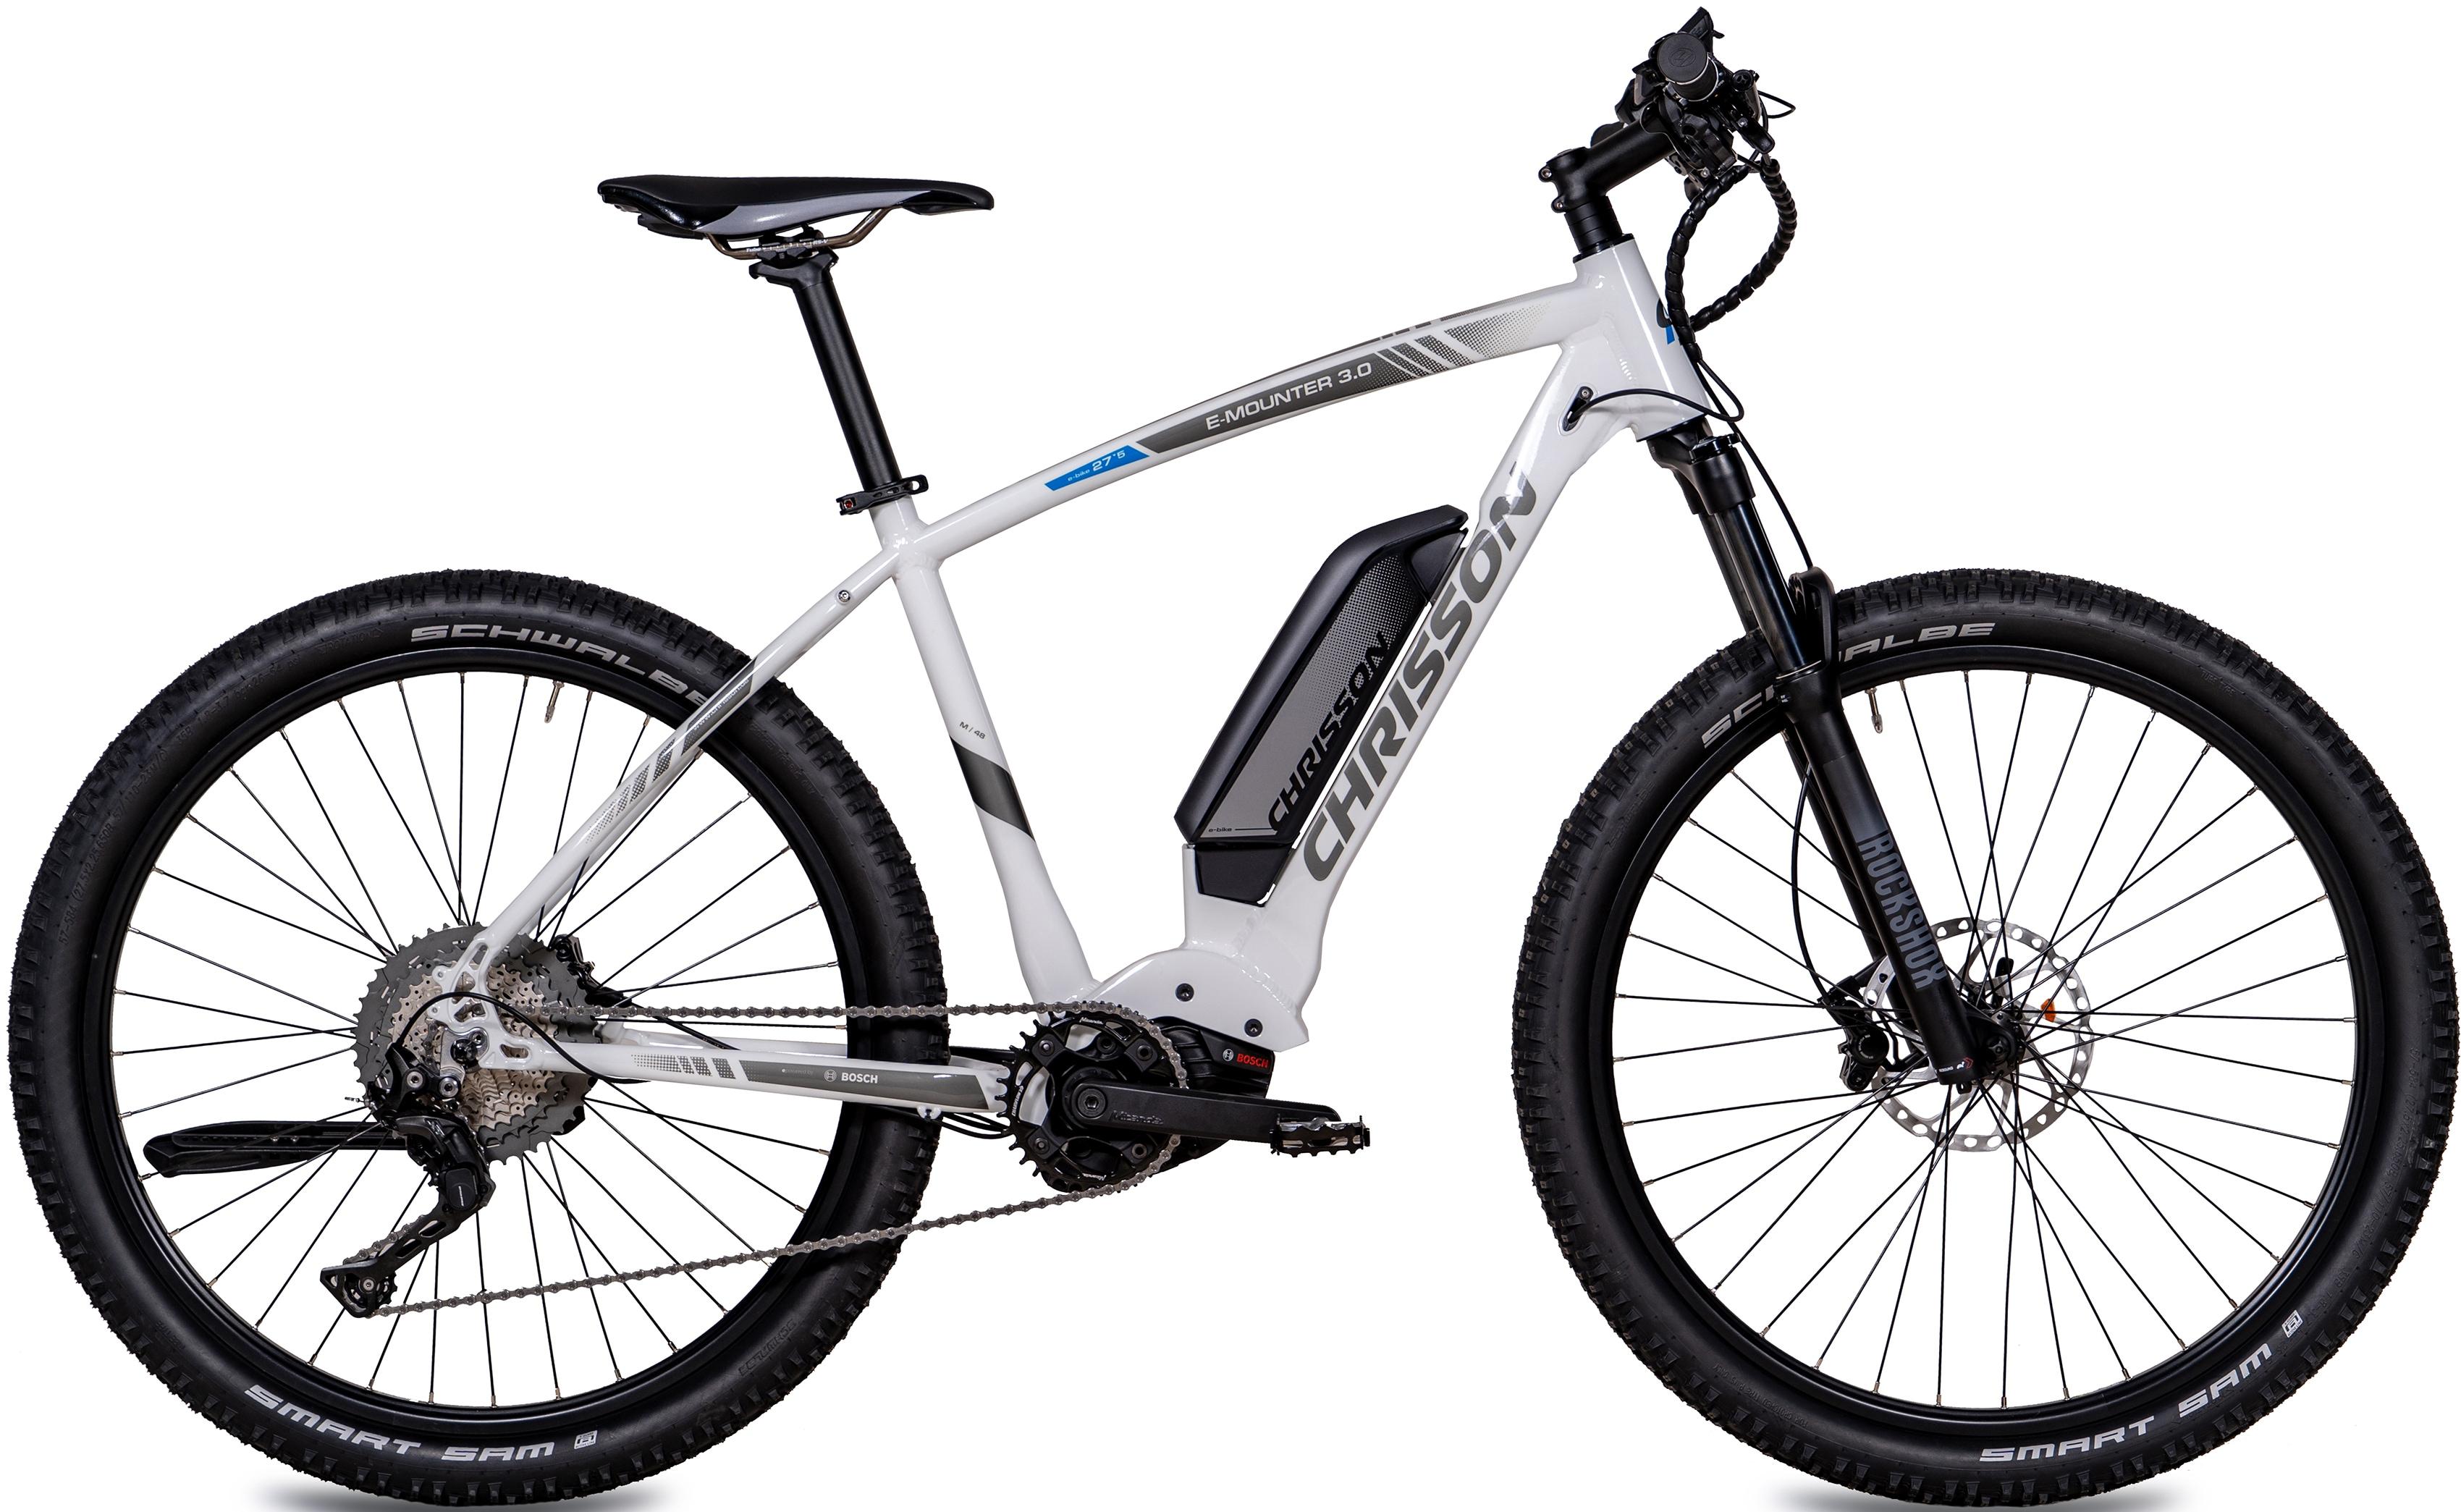 Chrisson E-Bike E-MOUNTER 3.0, 11 Gang, Shimano, Deore XT RD-M8000-SGS, Mittelmotor 250 W